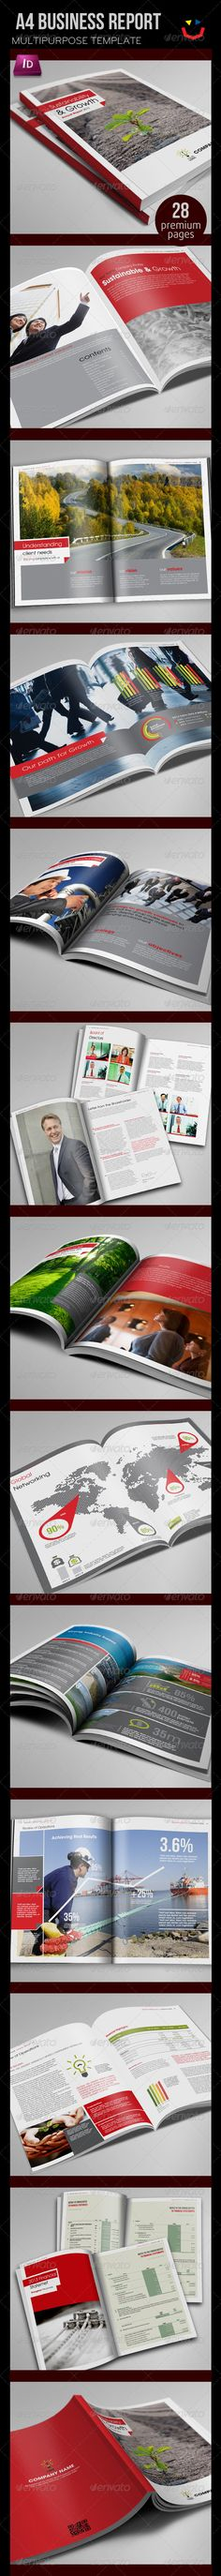 Nerd Luvinu0027 Kobo Design Nerdy Pinterest Http  www - business profile format